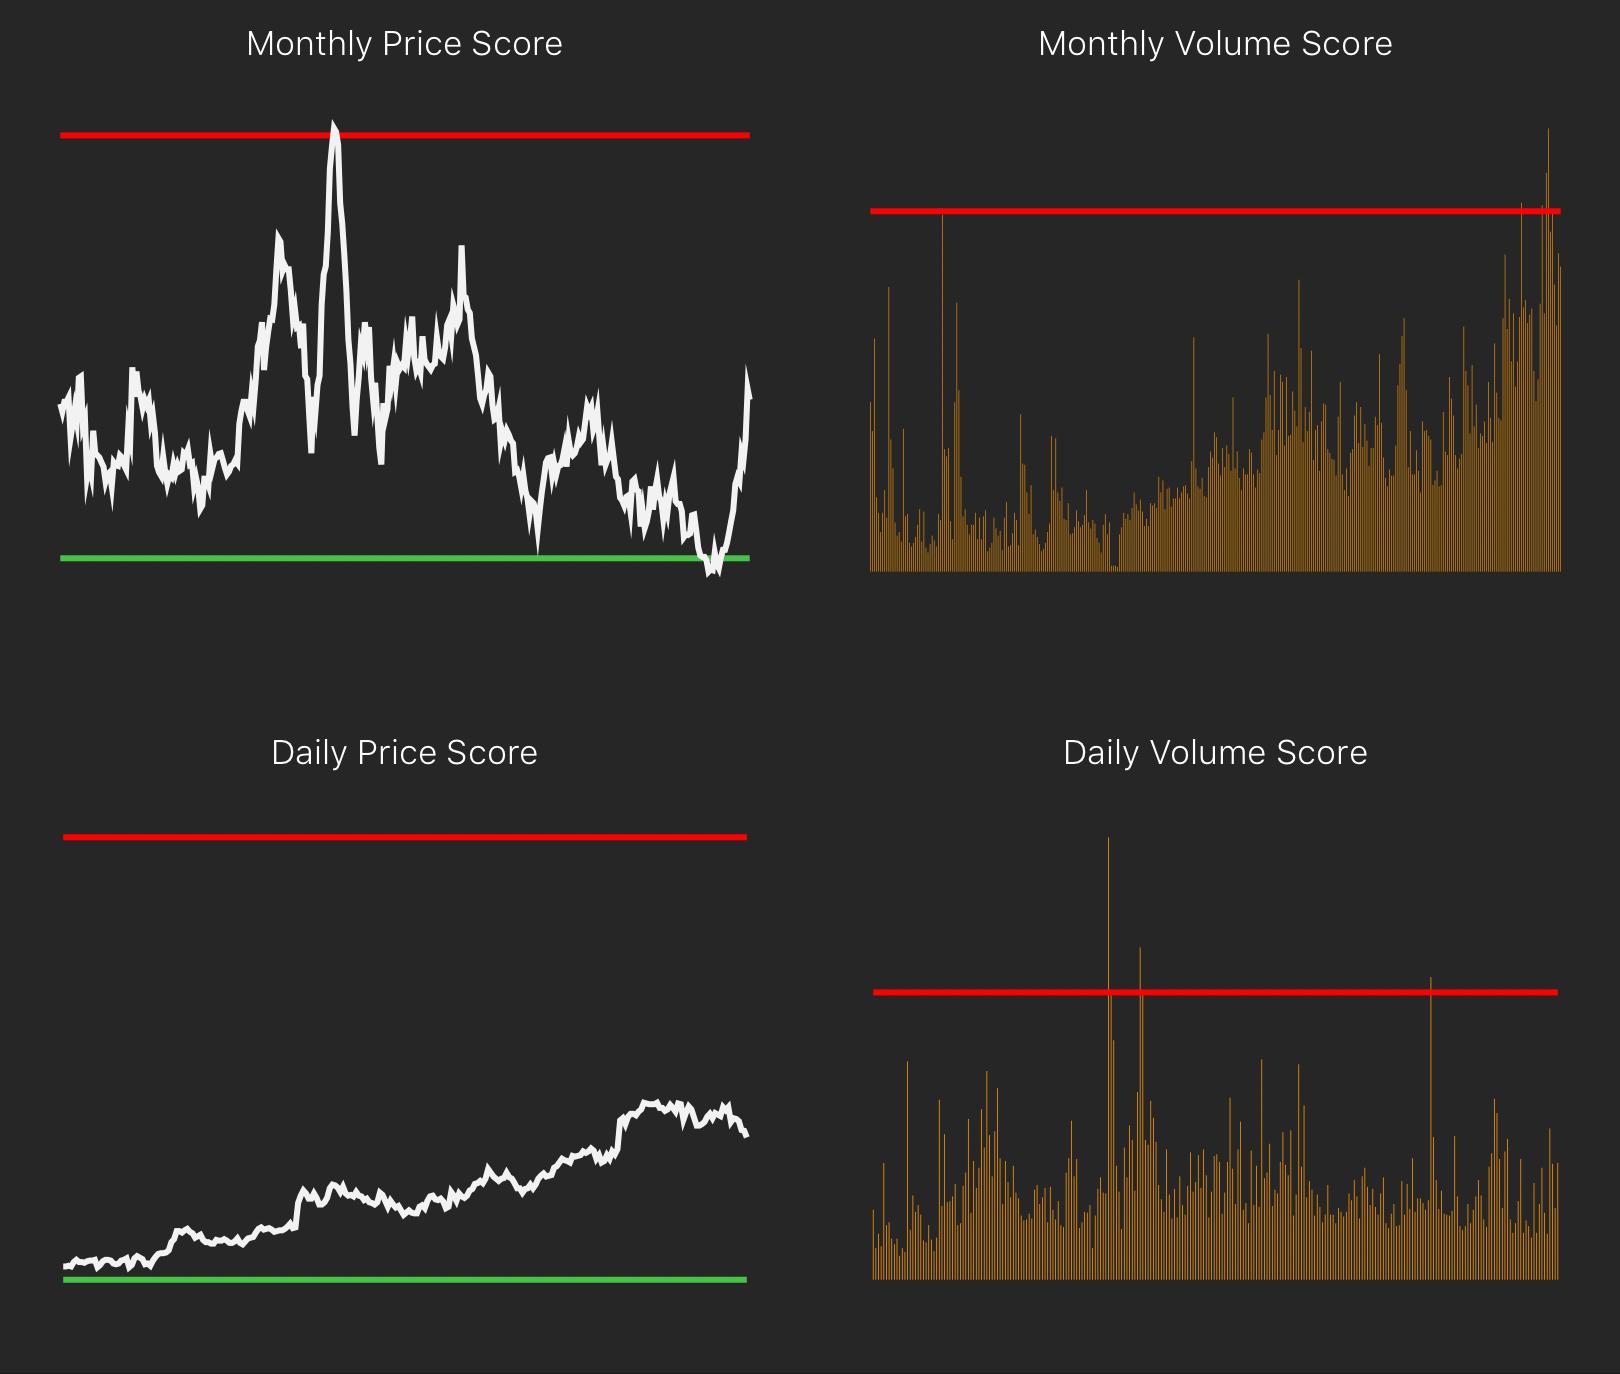 Price Scores & Volume Scores (5706) © PD Analytics Pte. Ltd. 2017